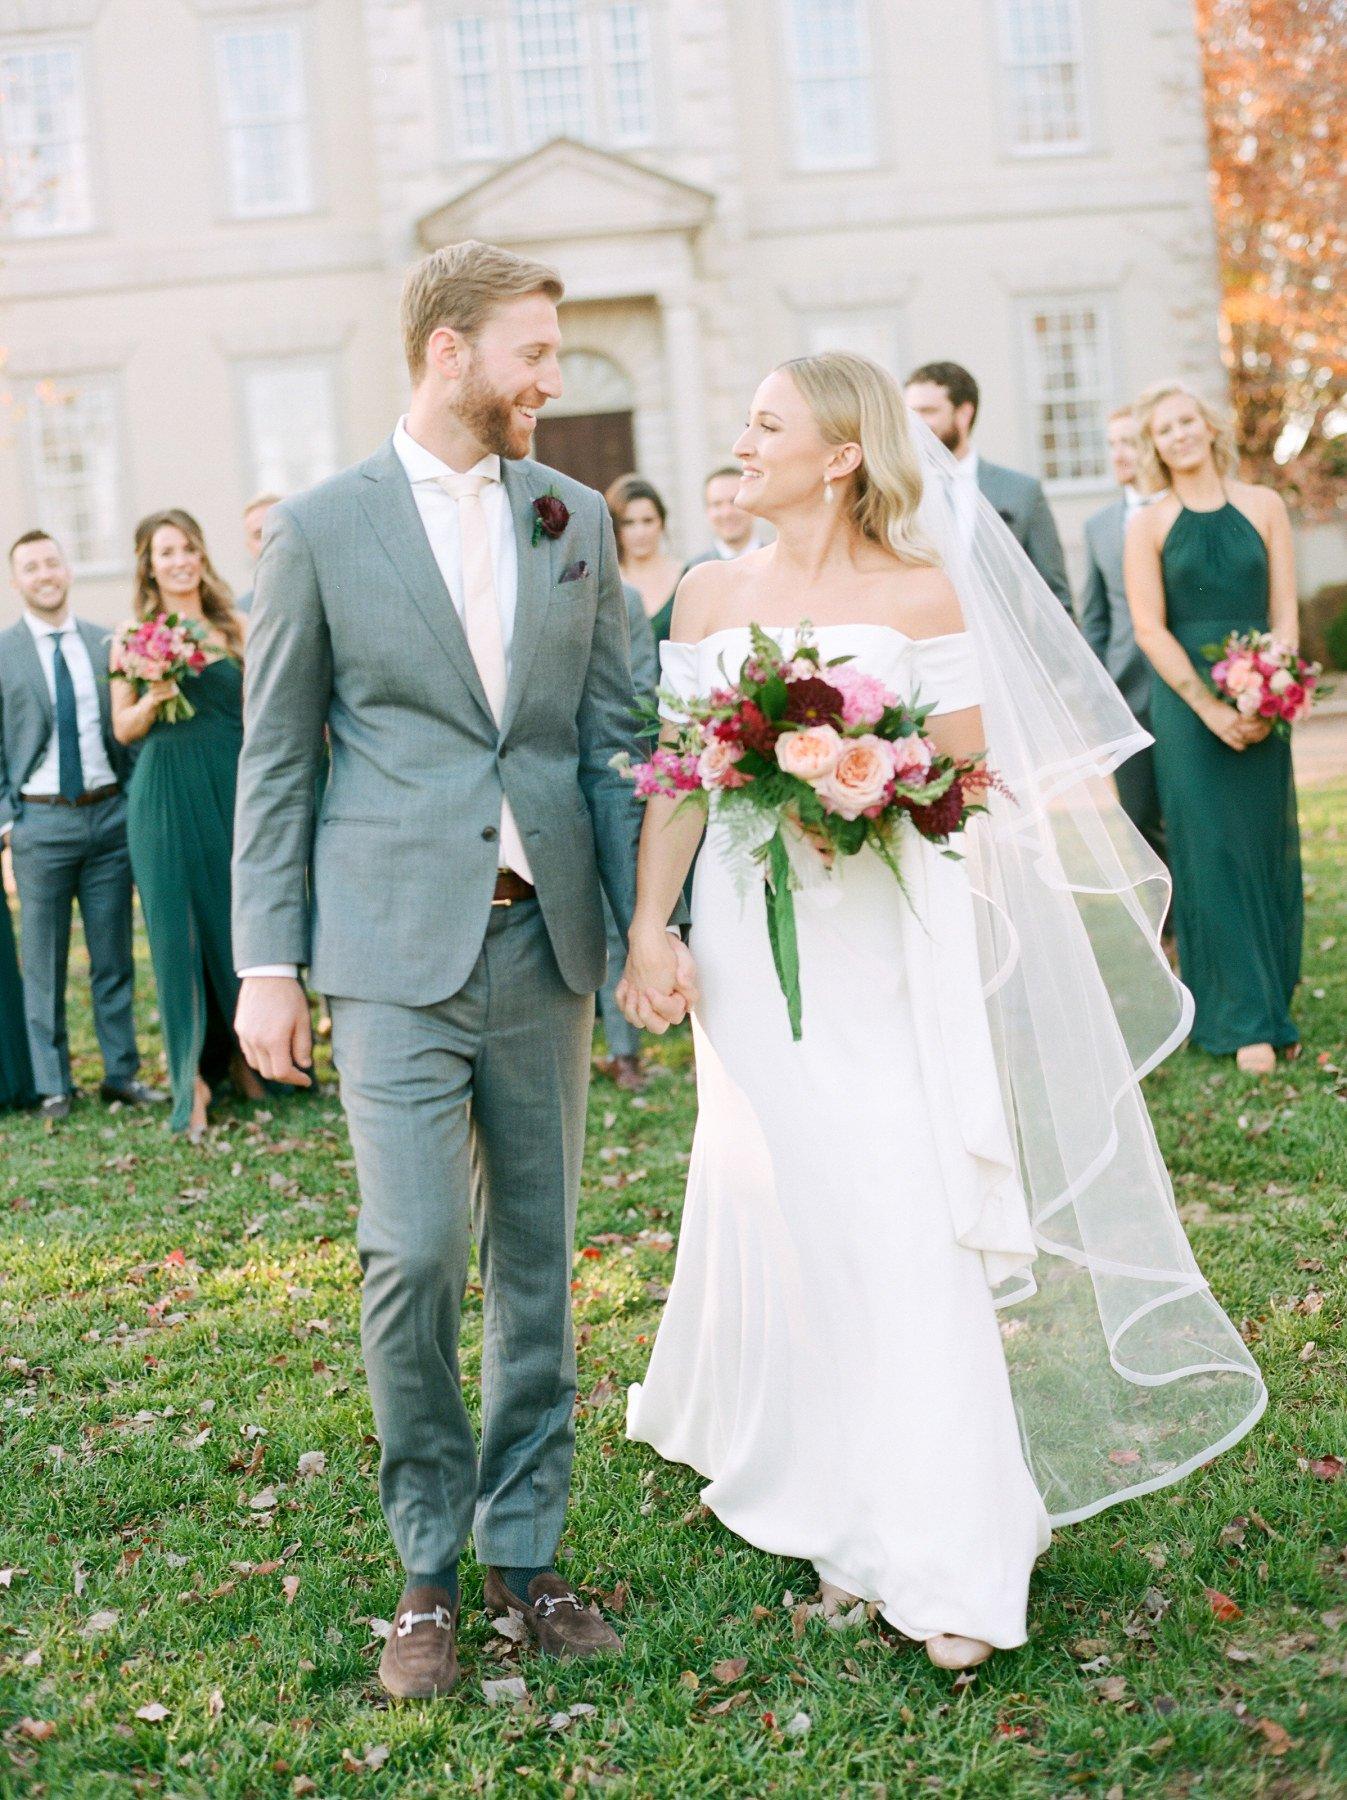 47Great_Marsh_Estates_Wedding_Anne_Kelley_Events_Astrid_Photography146486130015-2